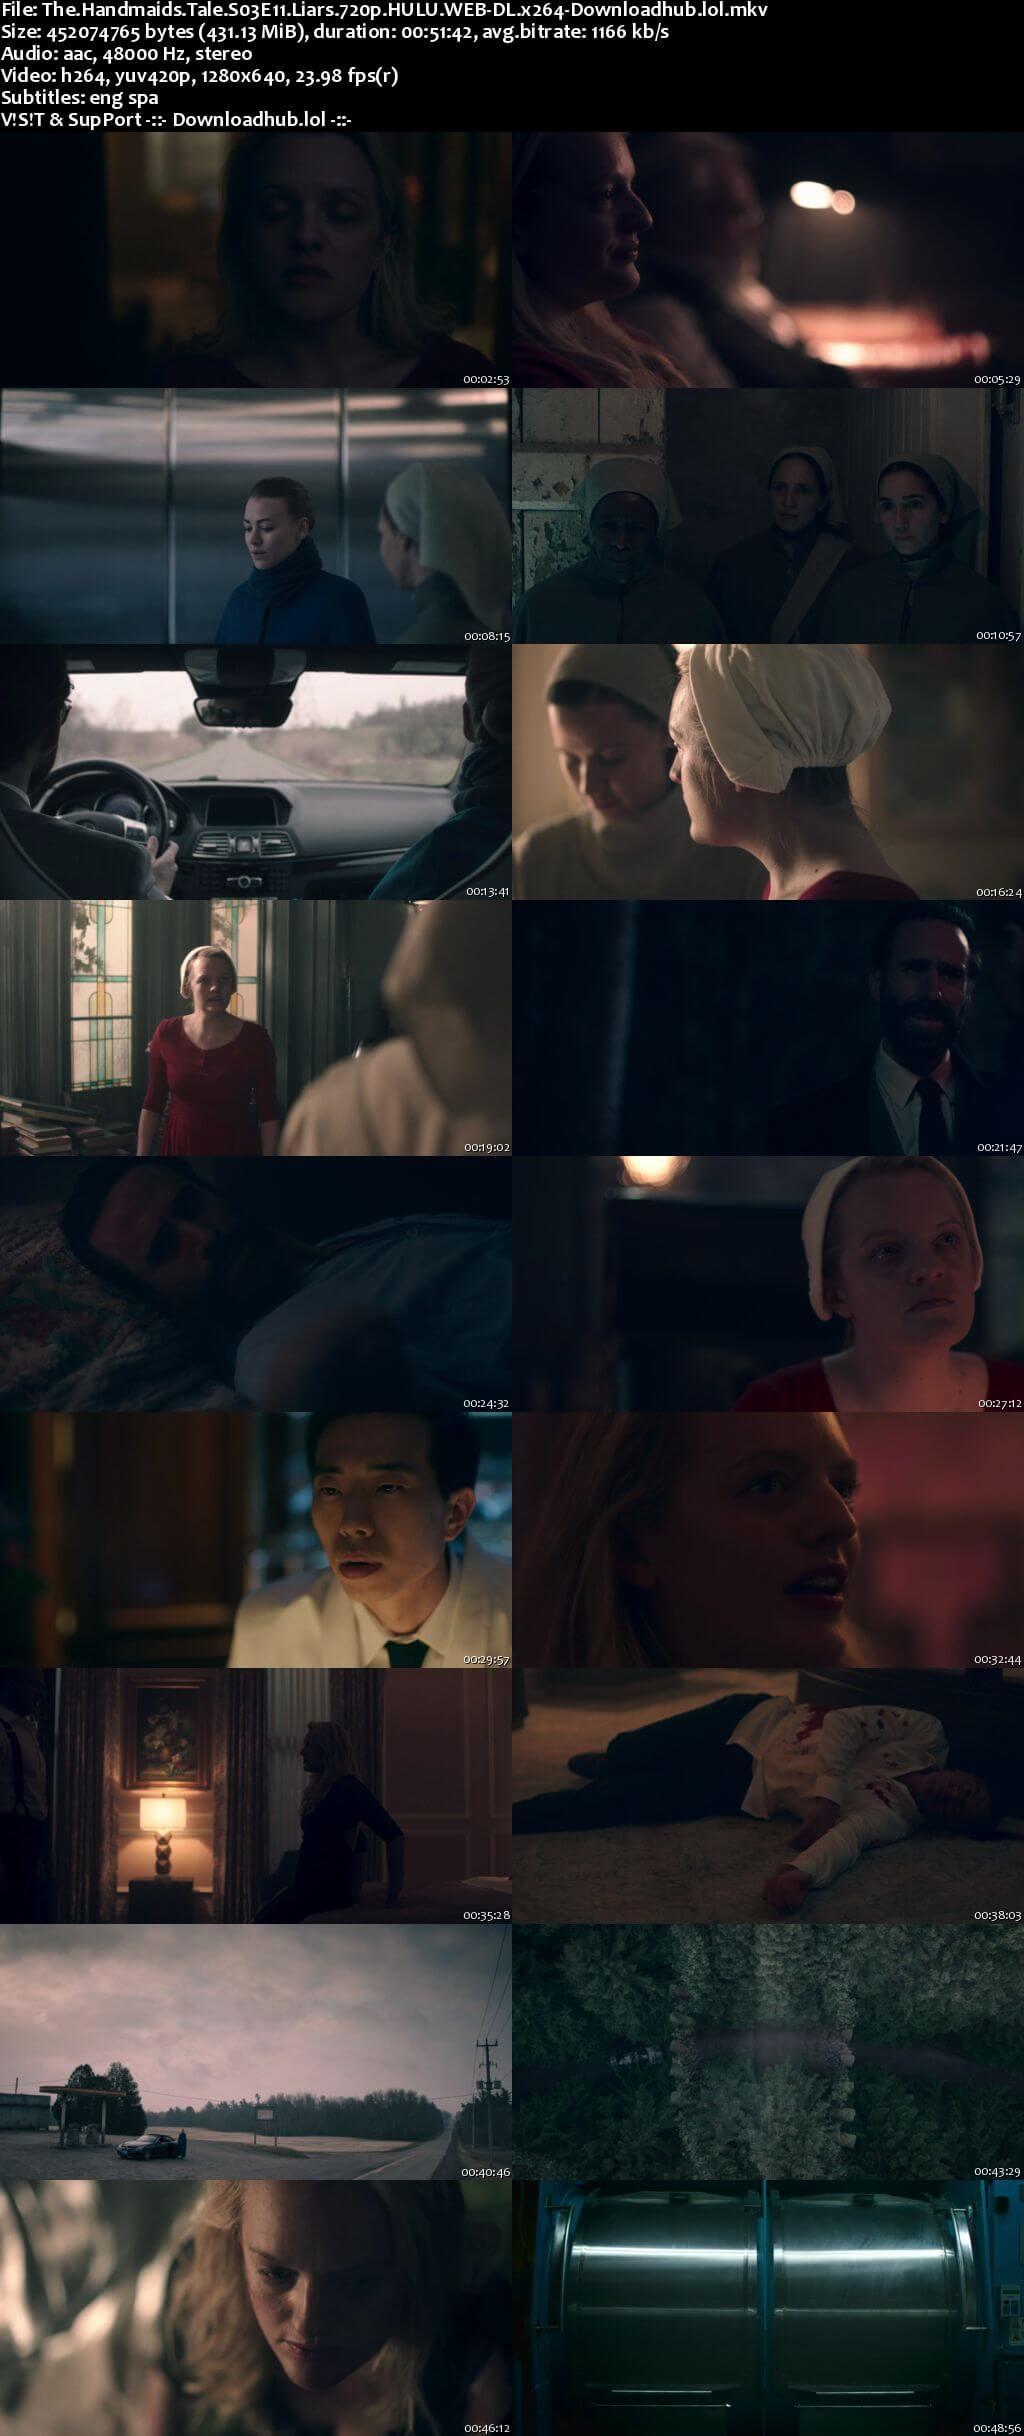 The Handmaids Tale S03E11 400MB WEB-DL 720p ESubs